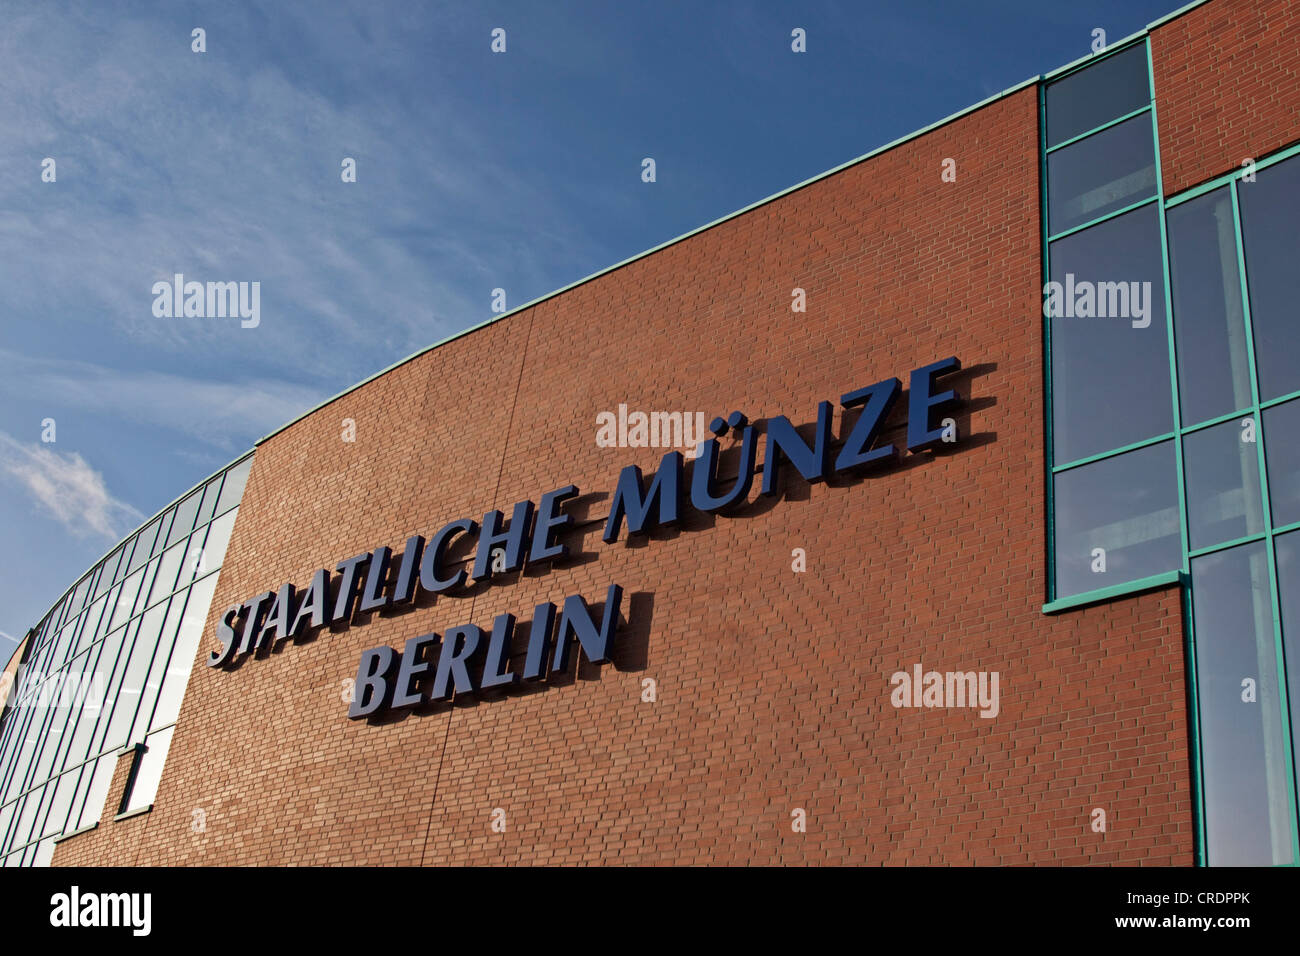 Staatliche Muenze Berlin State Mint Berlin Smb 1280 Mint In The